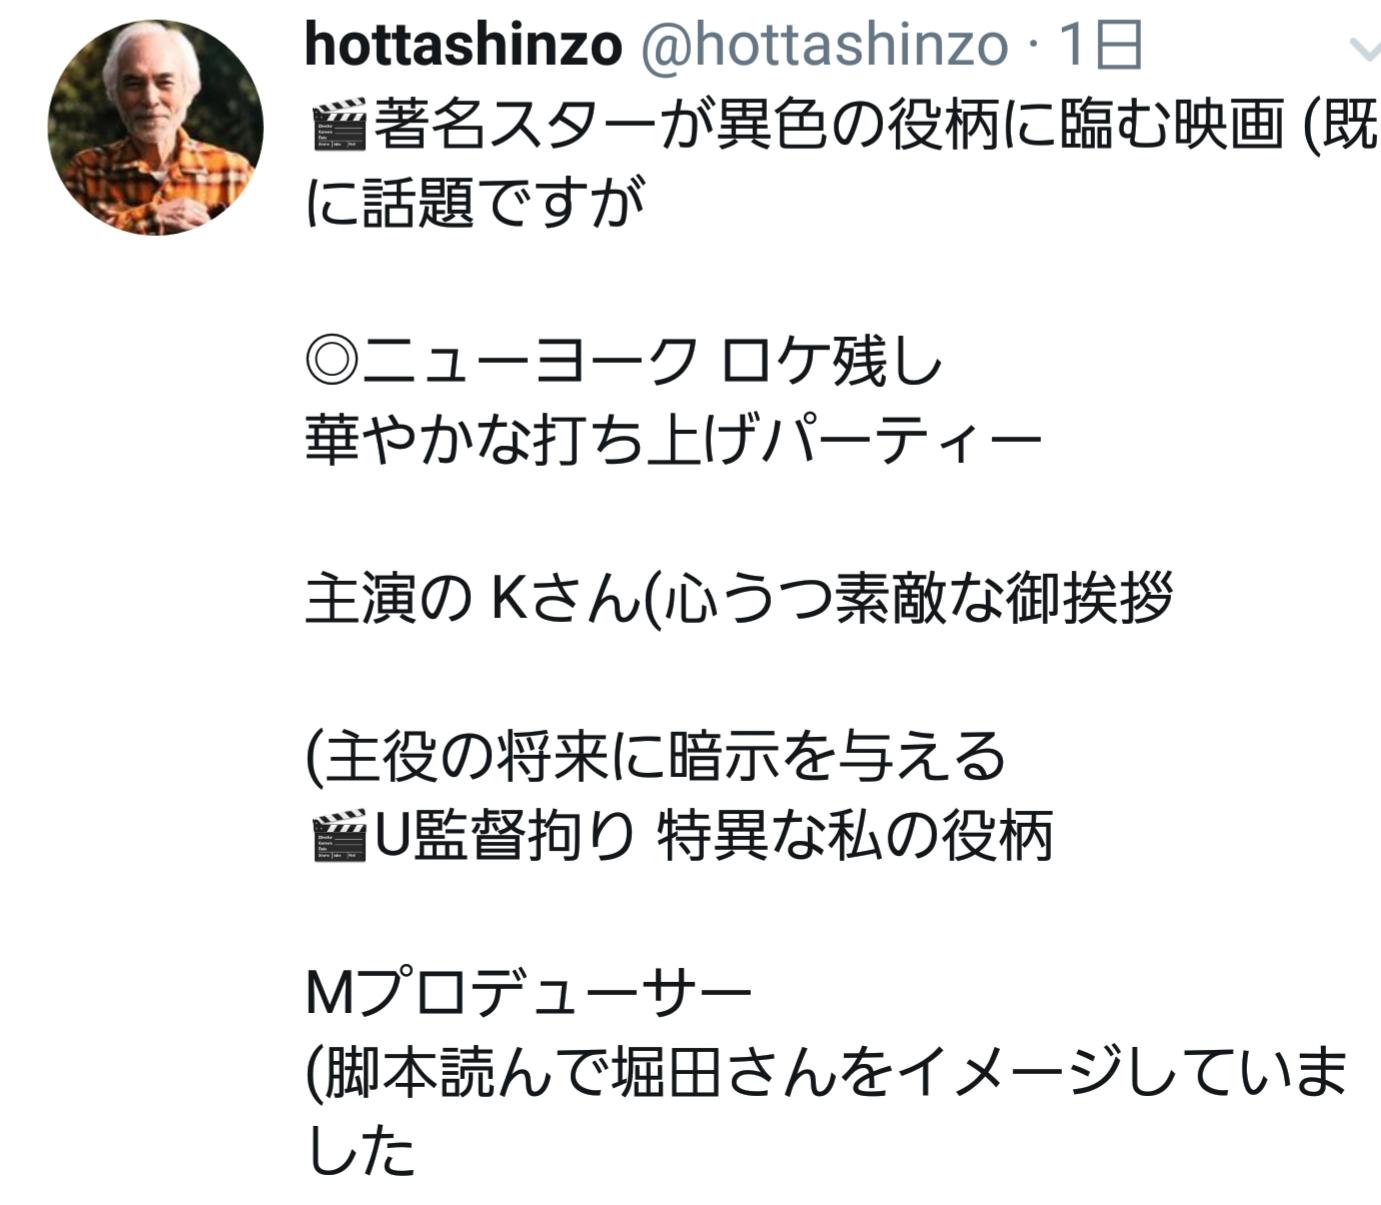 20191204212721ce3.jpg